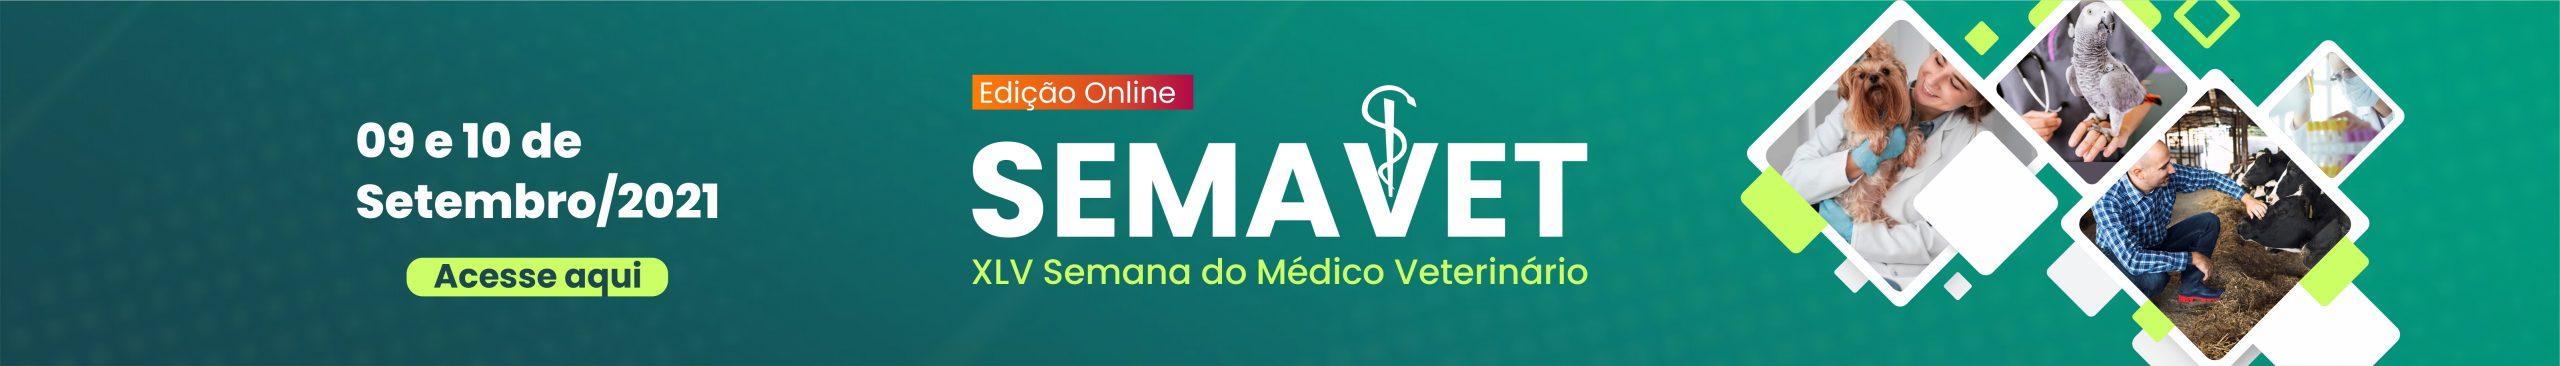 banner site principal